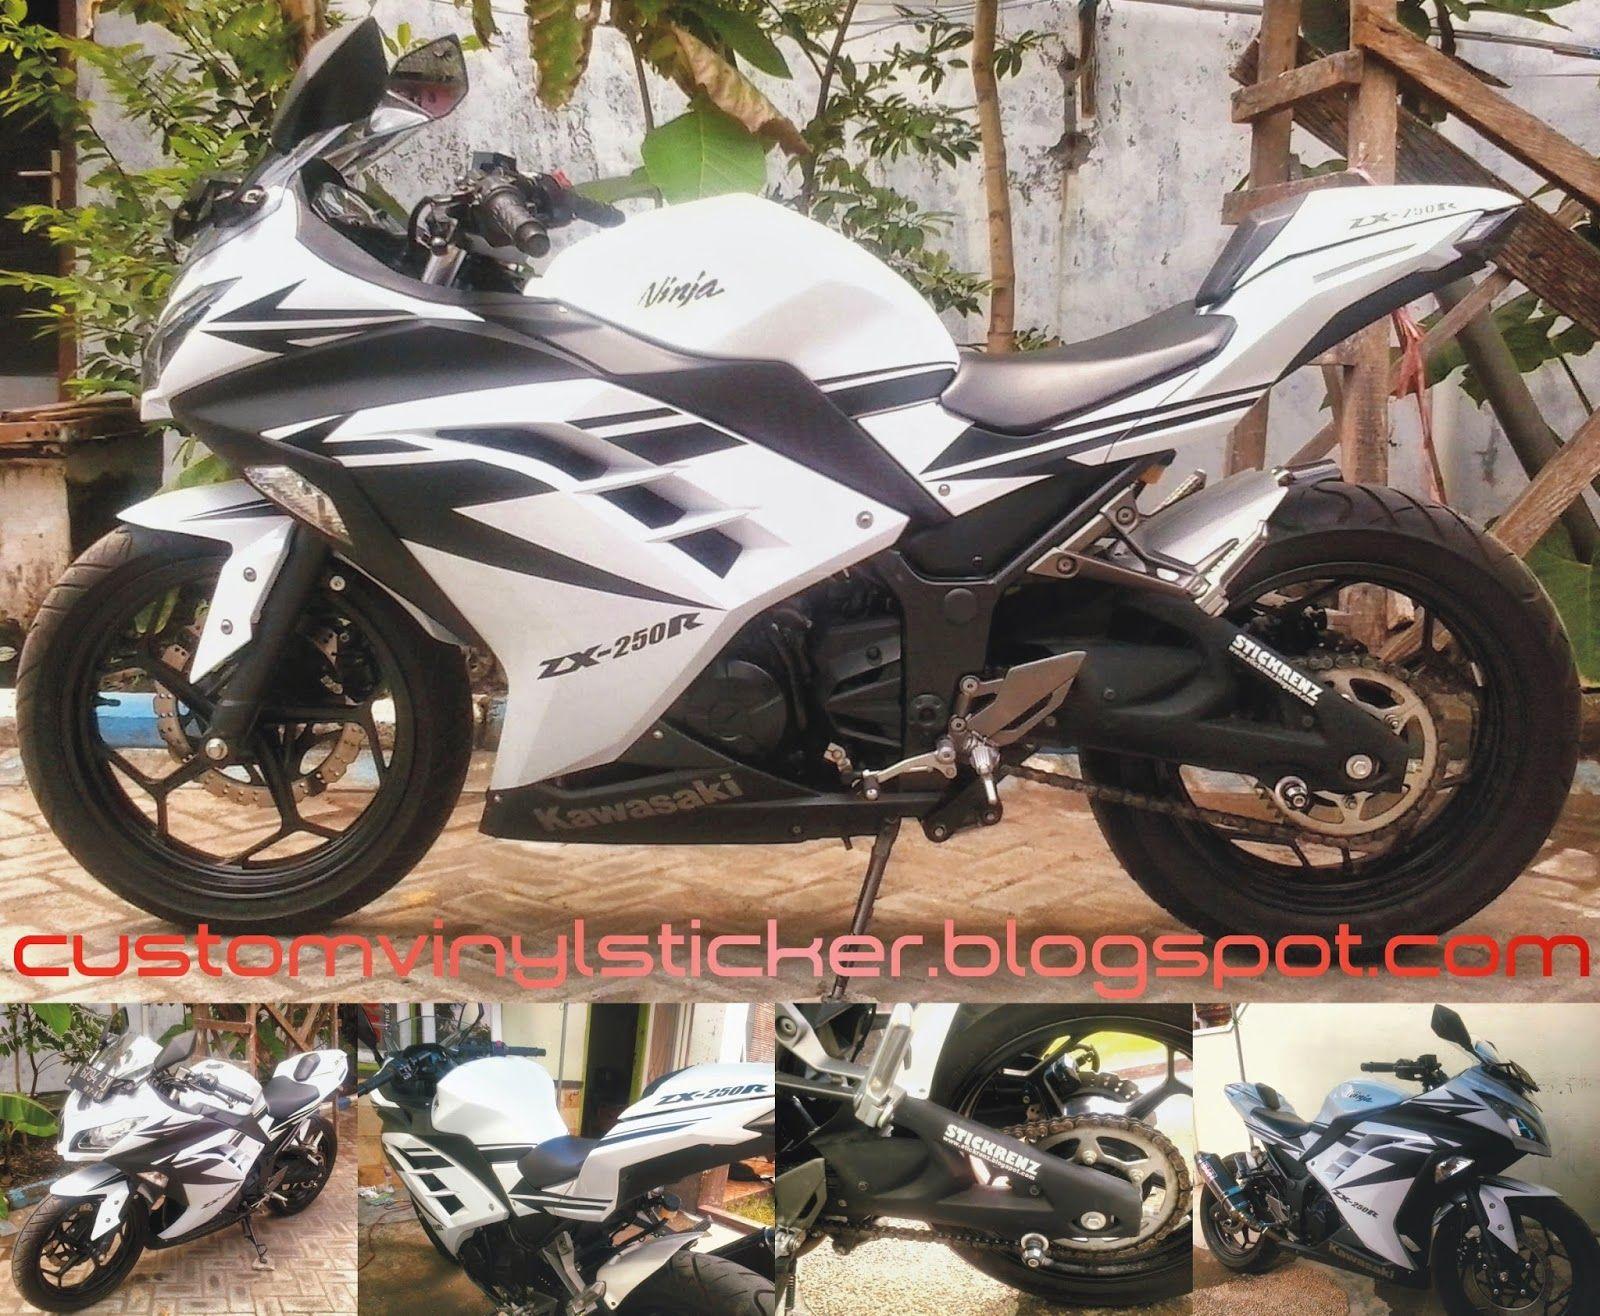 Design sticker ninja 250 -  Kawasaki Ninja 250 F1 White Black Mate Arrow Sticker